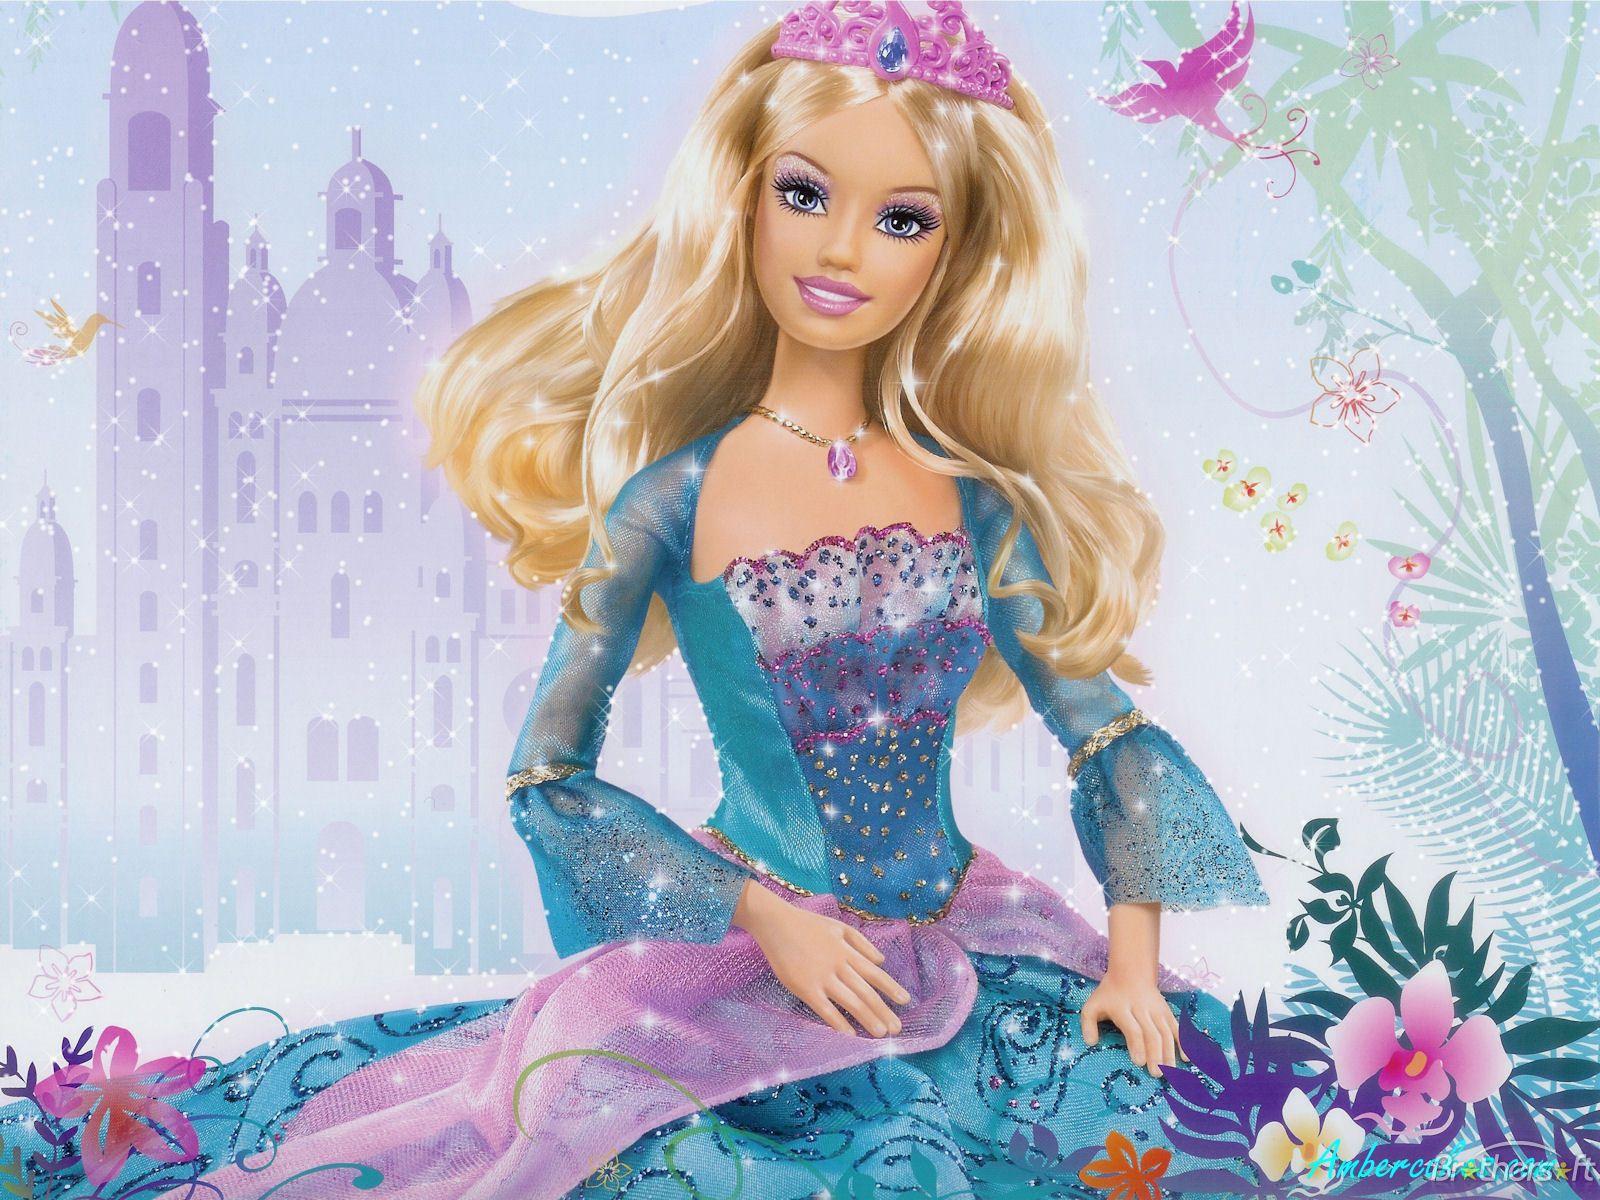 Gambar Wallpaper Kartun Barbie - Kumpulan Wallpaper